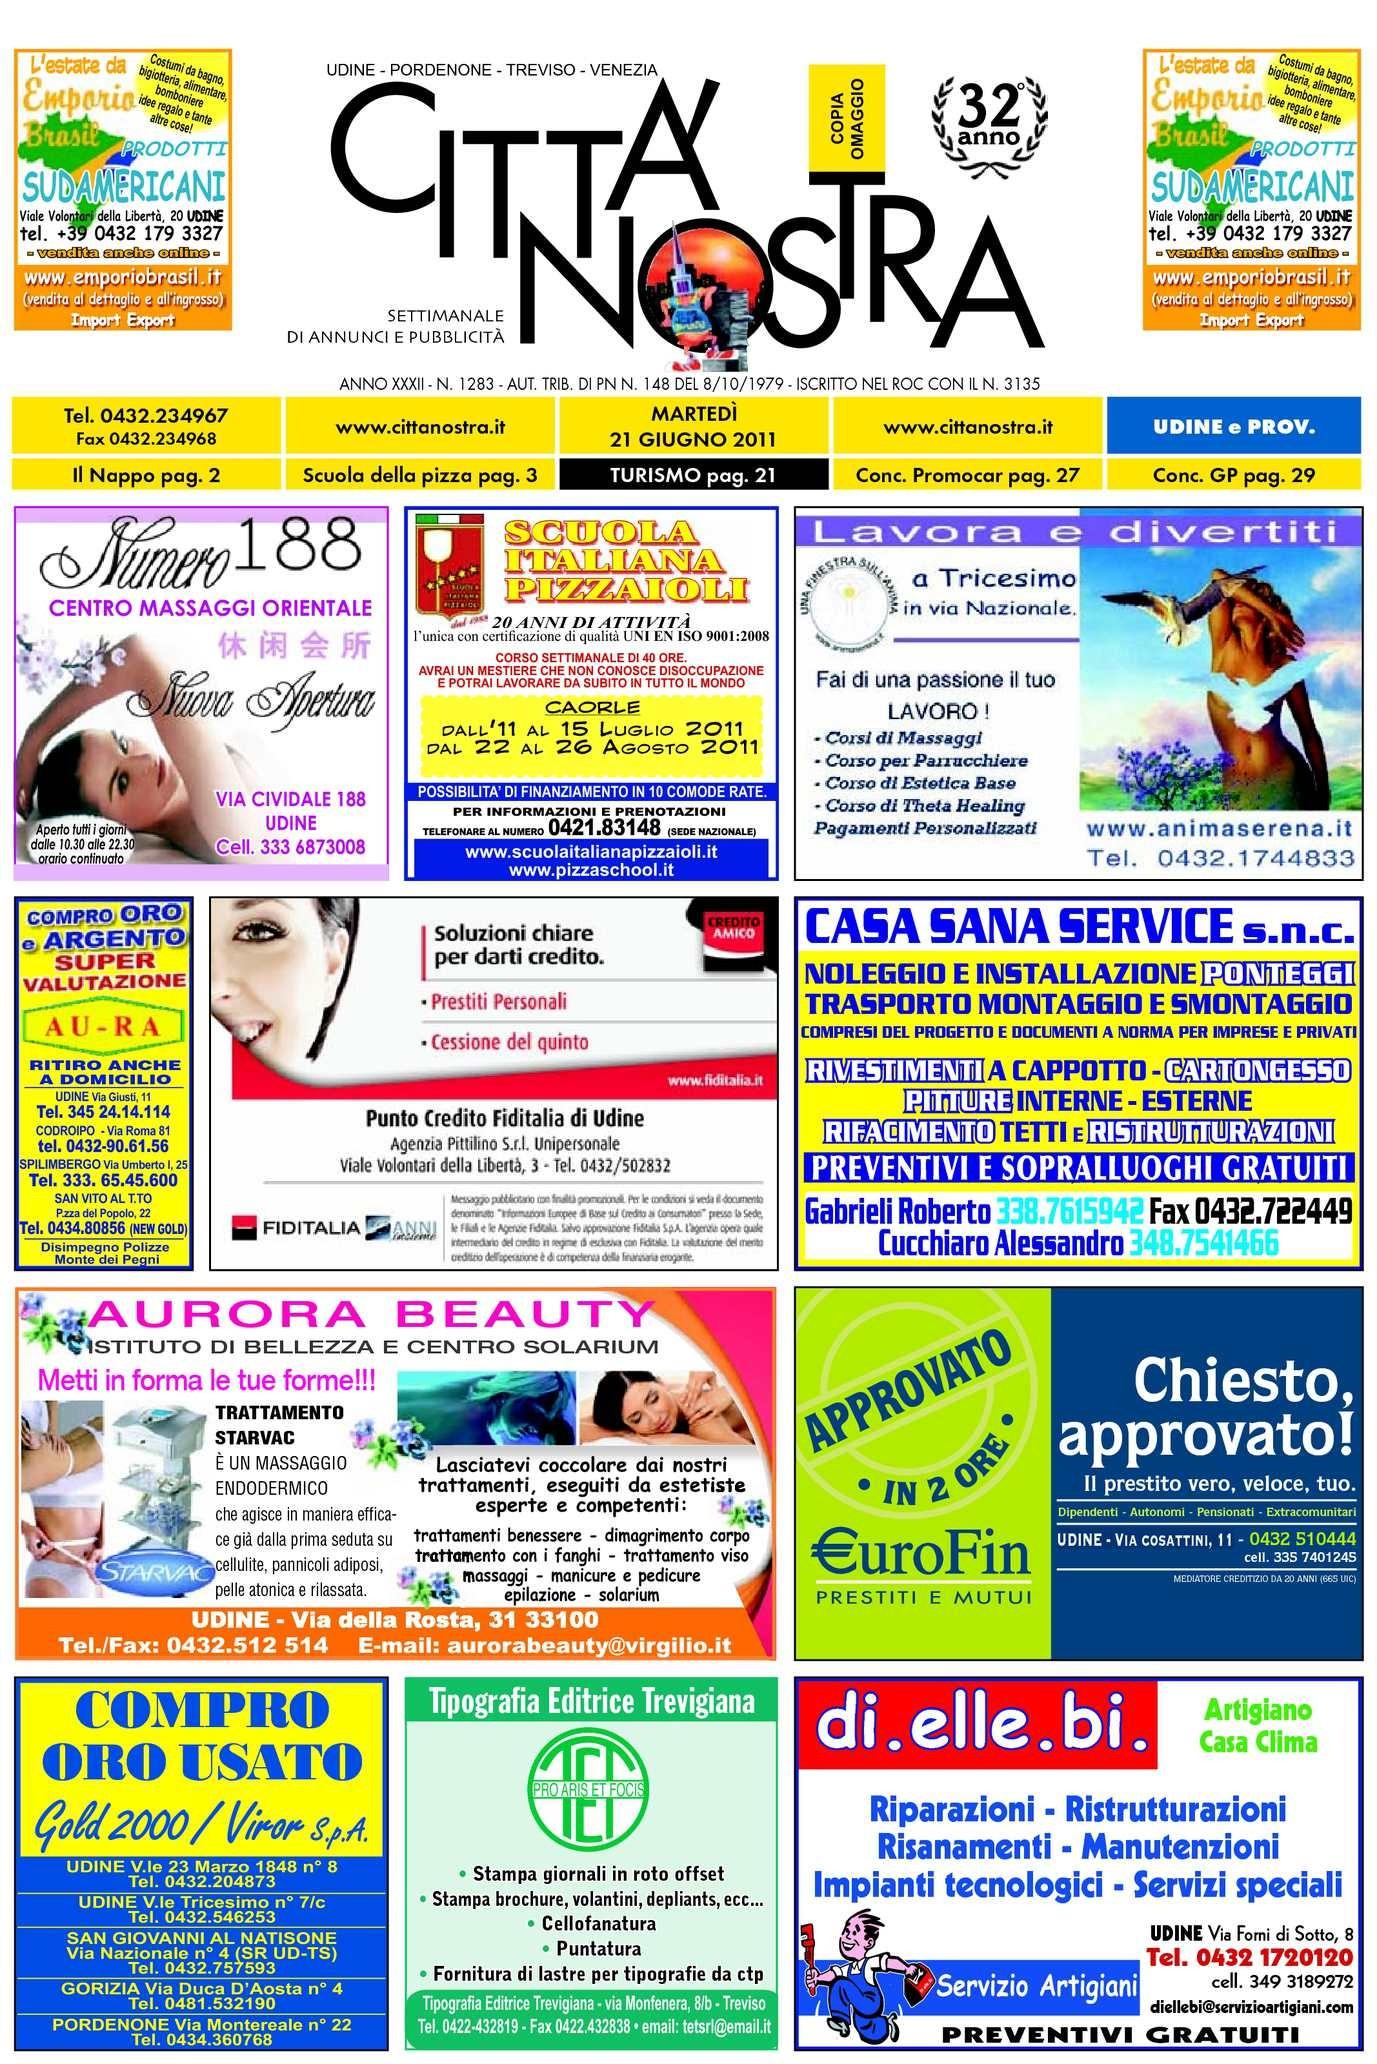 Calaméo Citt Nostra Udine del 21 06 2011 n 1283